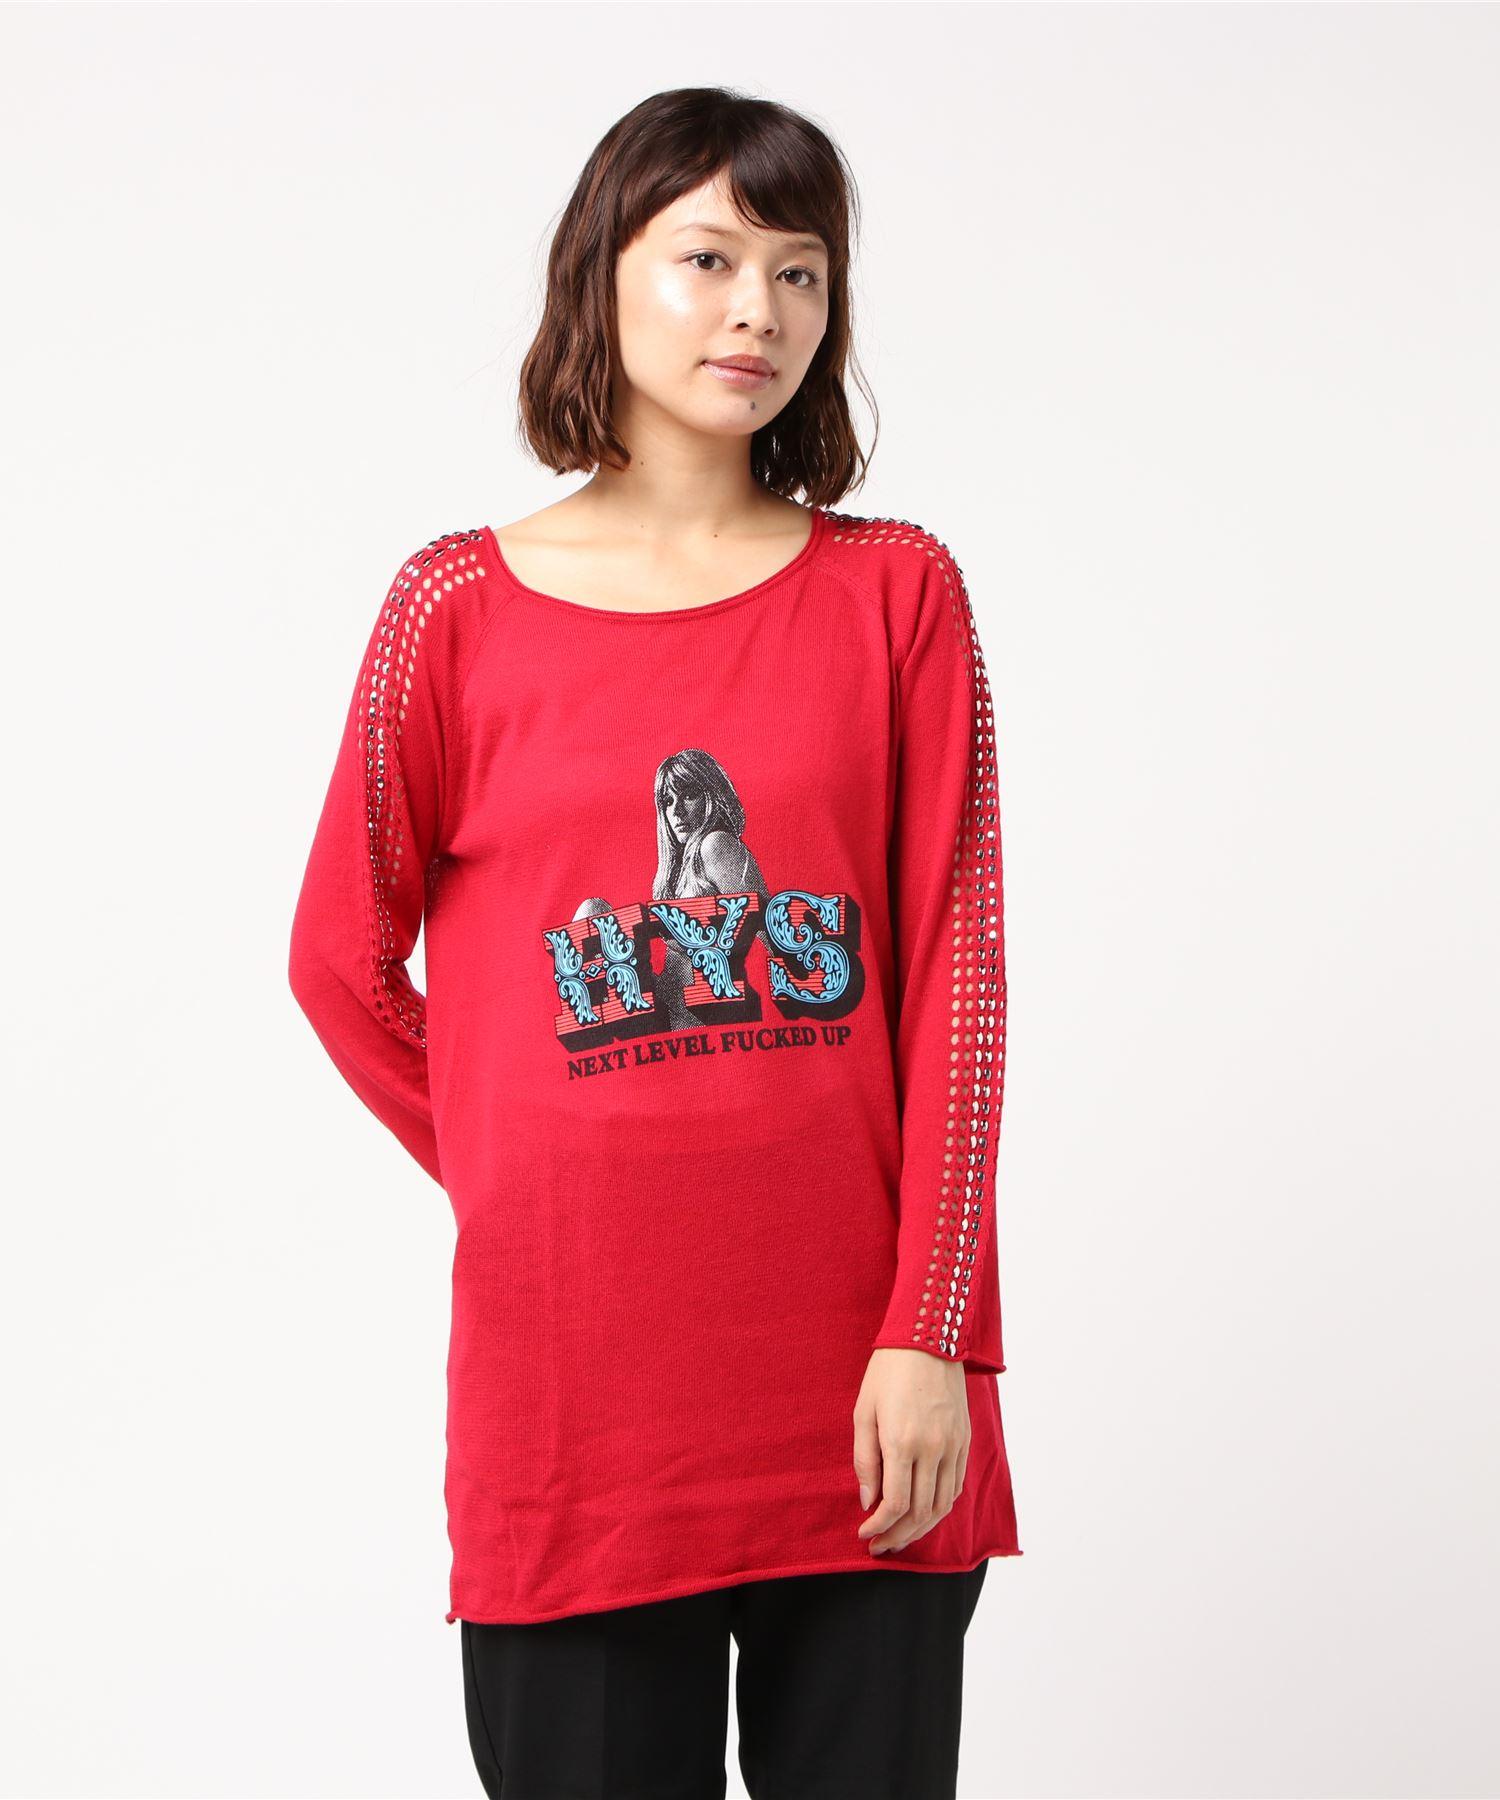 NEXT LEVEL透かし編みプルオーバー